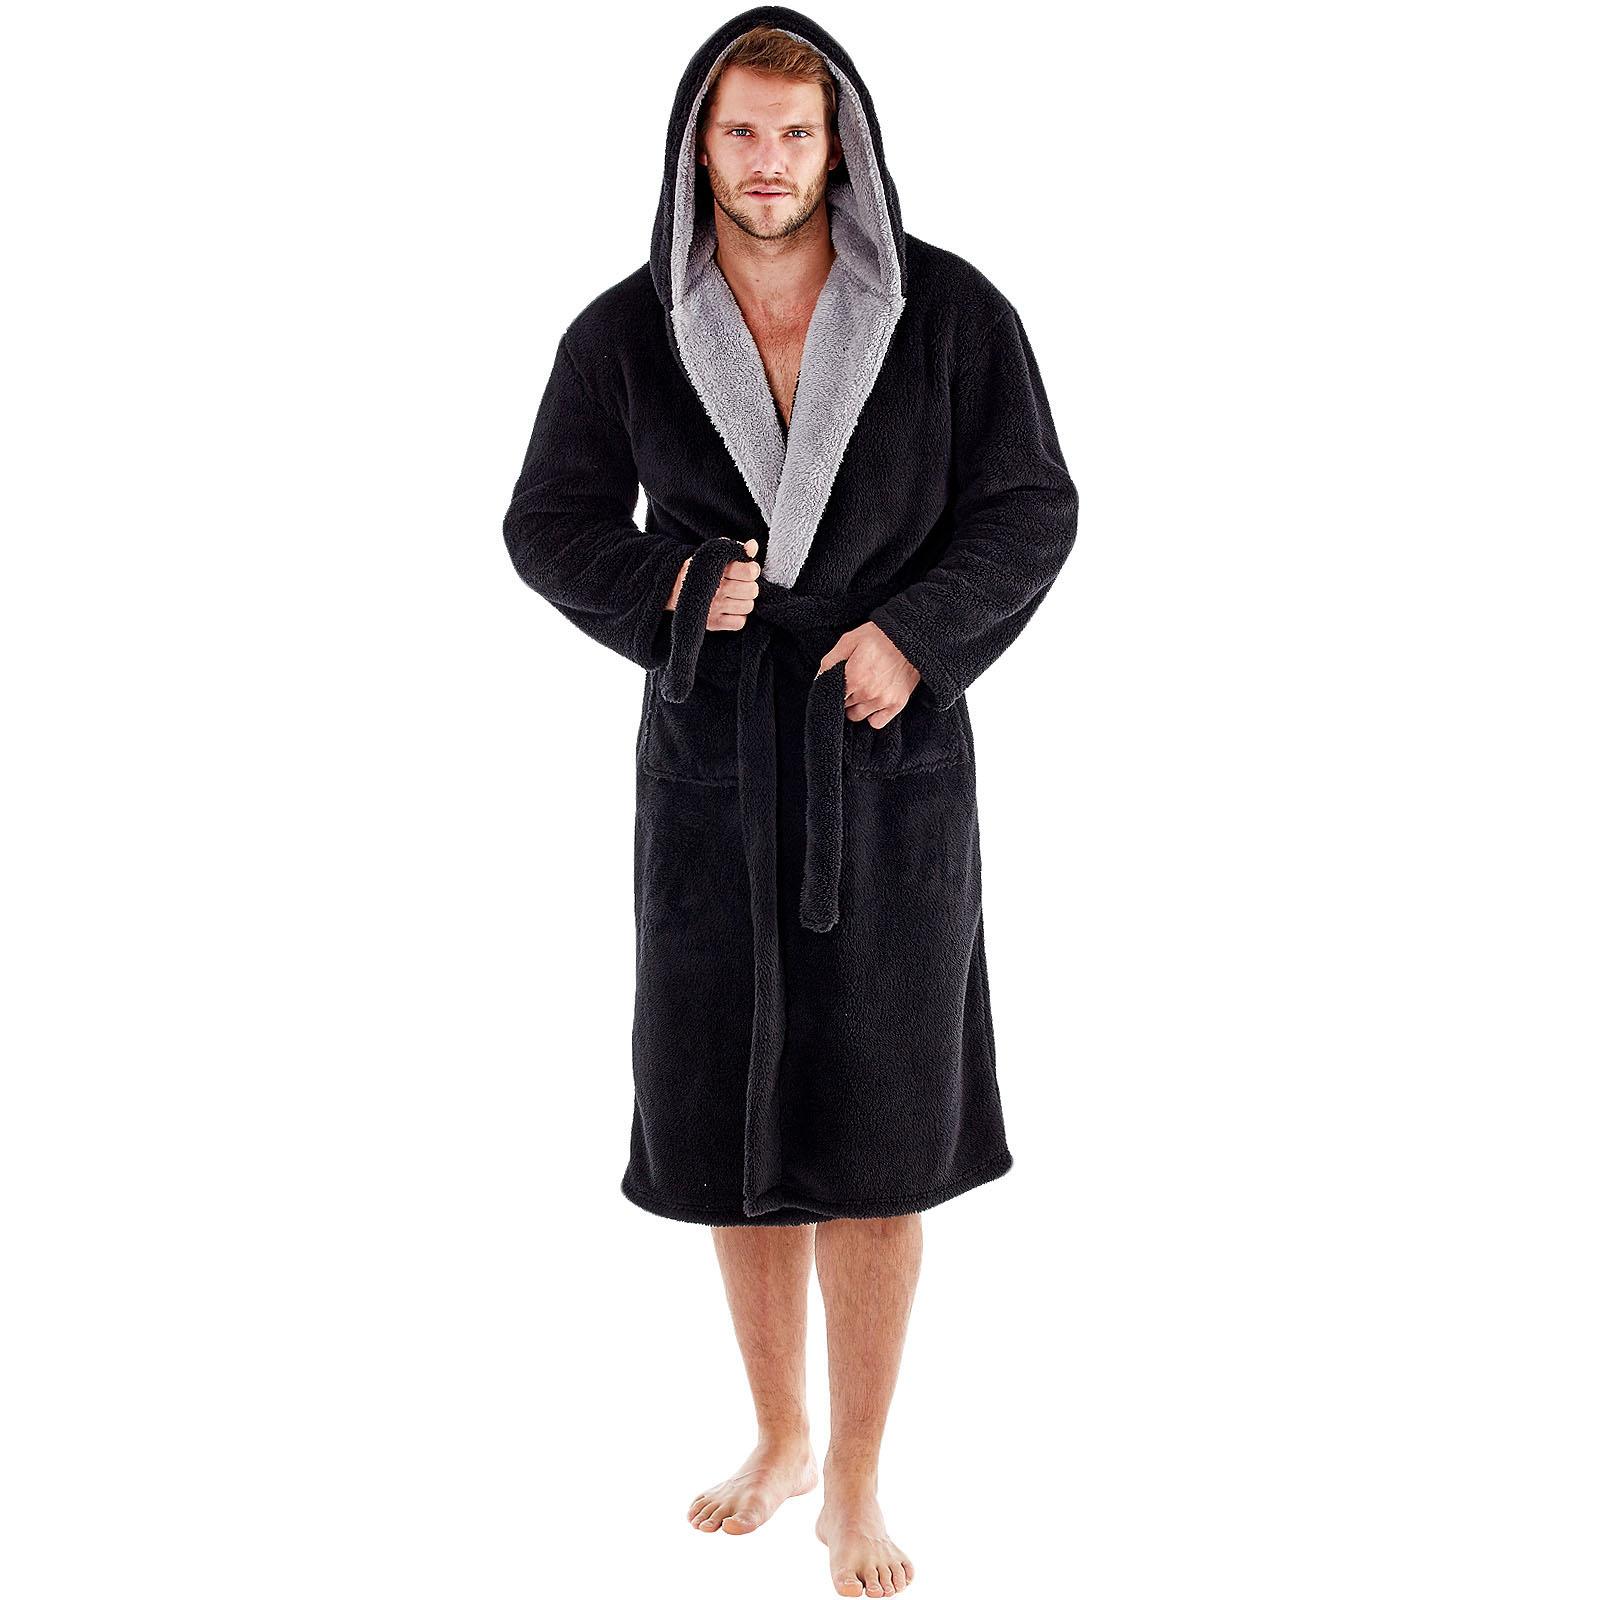 Snuggaroo Mens Soft Fleece Long Sleeve Hooded Lounge Bath Robe Dressing Gown